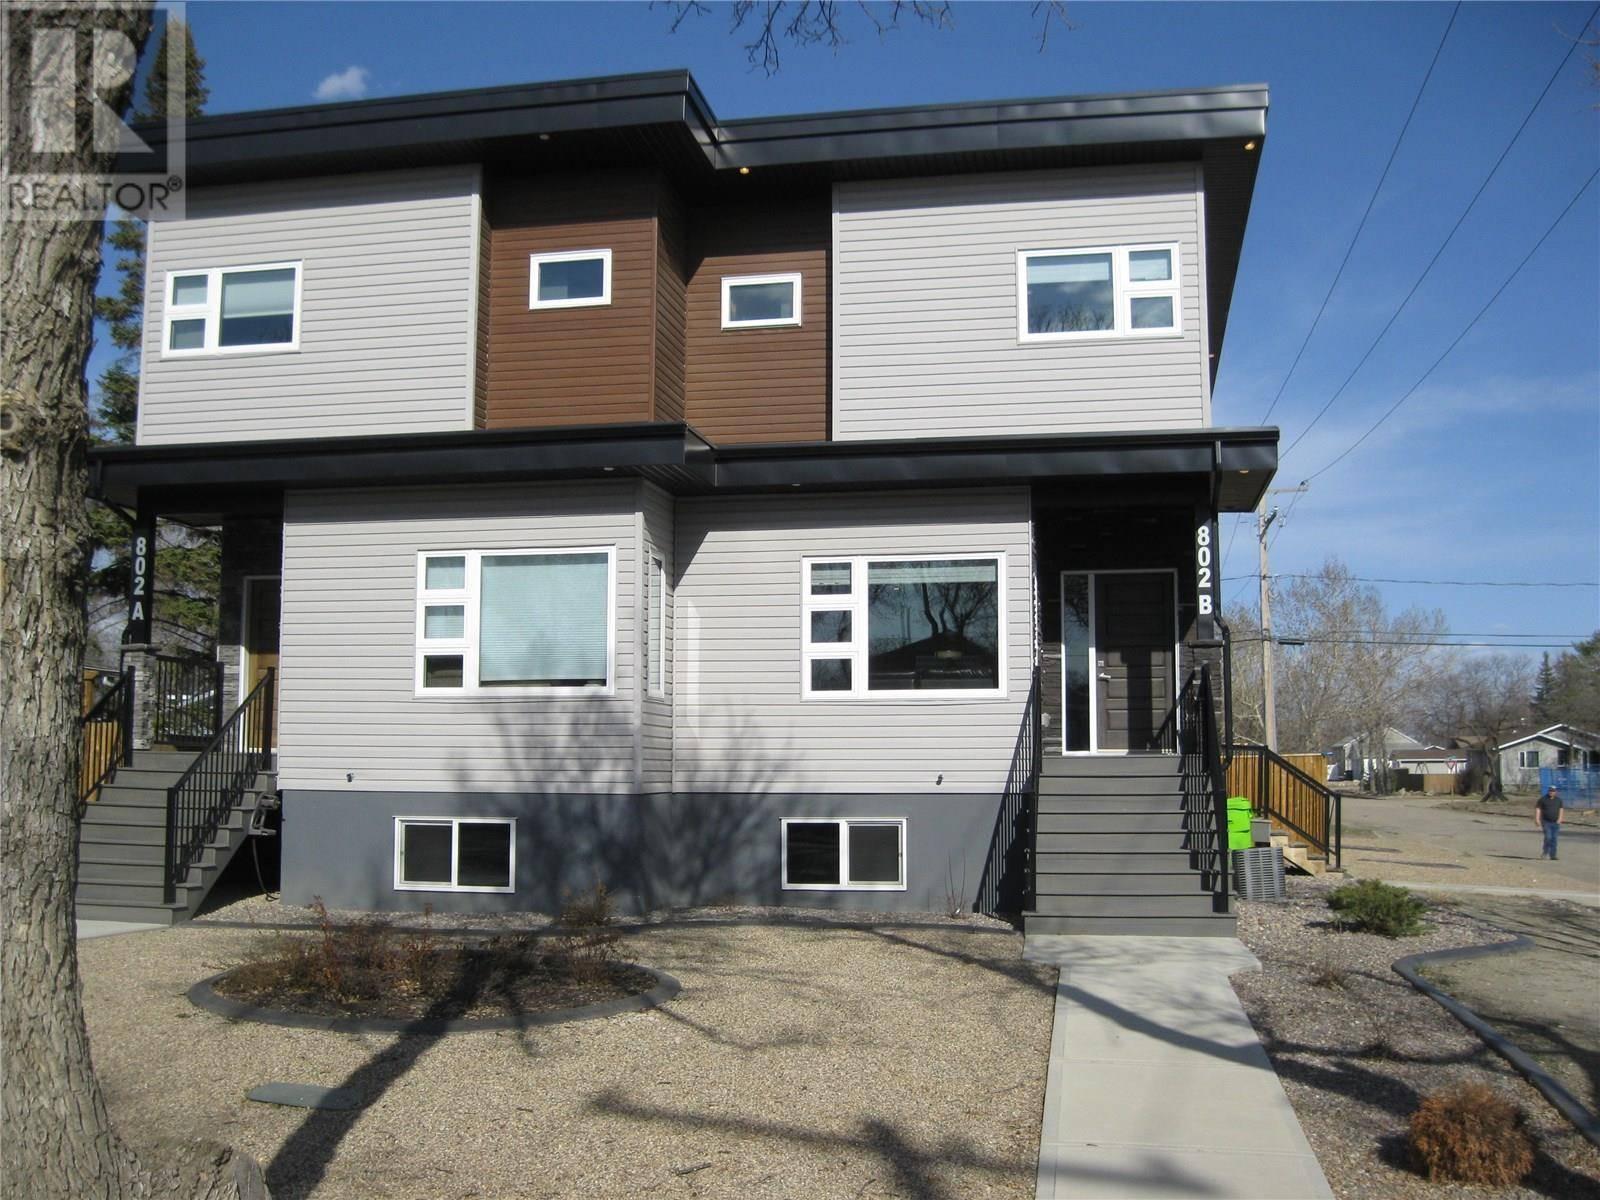 House for sale at 802 King St Rosetown Saskatchewan - MLS: SK770999